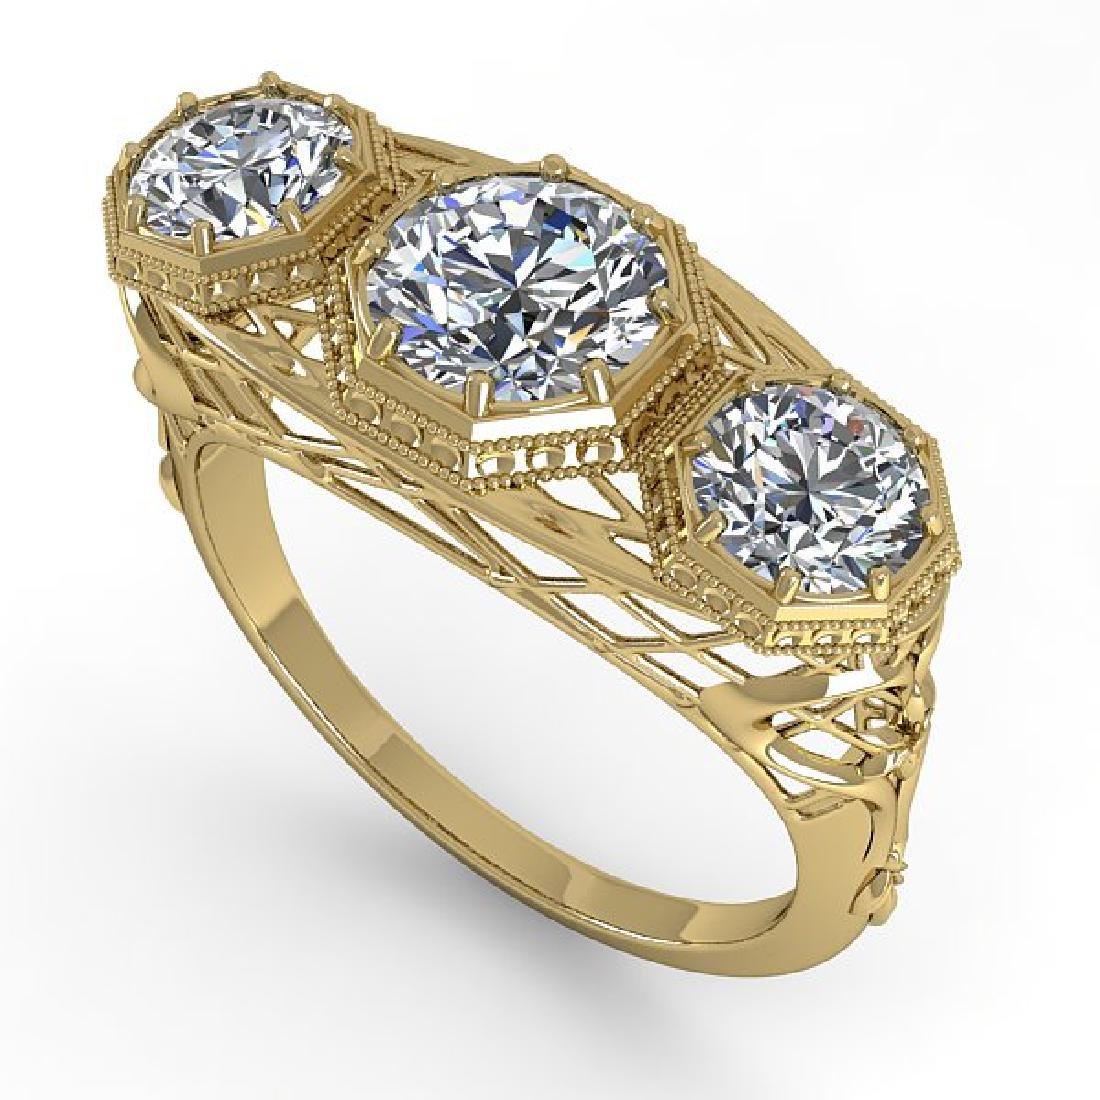 2 CTW VS/SI Diamond Ring 14K Yellow Gold - 2